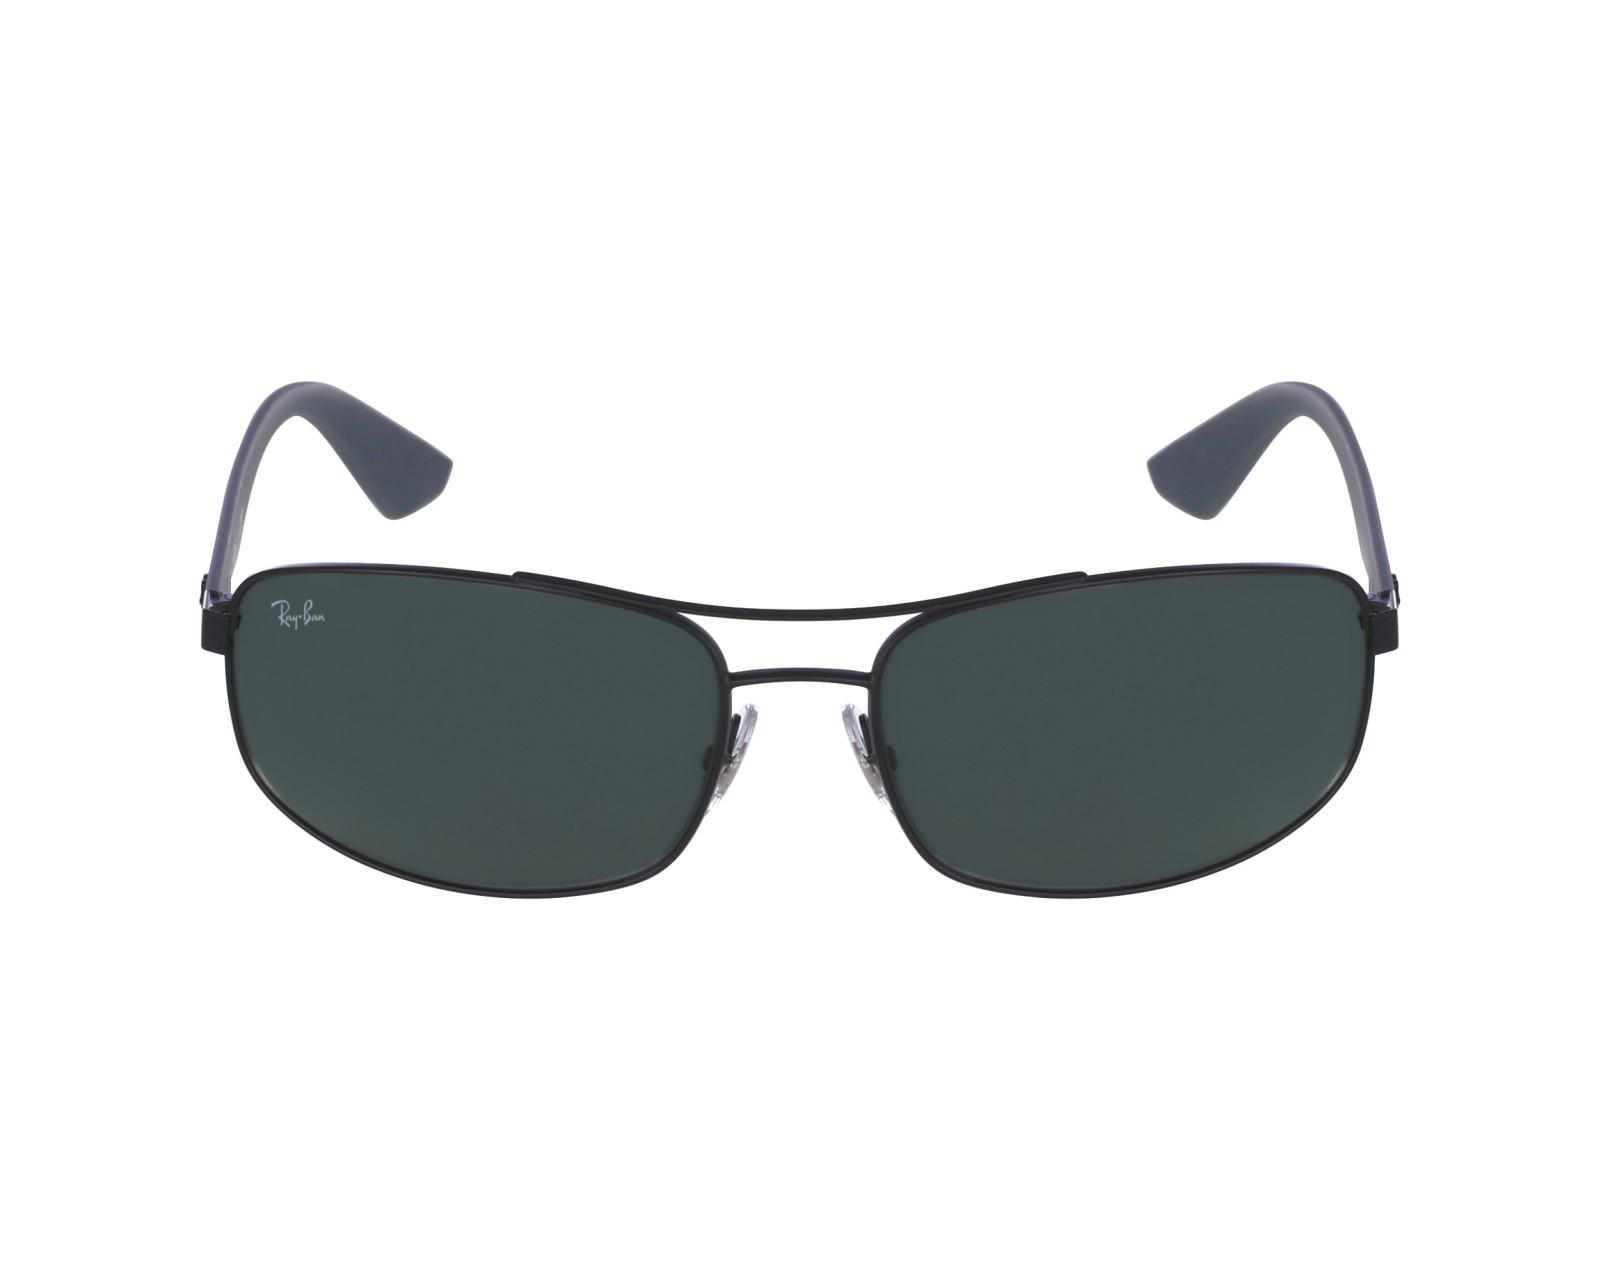 c4aa22b8172 thumbnail Sunglasses Ray-Ban RB-3527 006 71 - Black Grey profile view